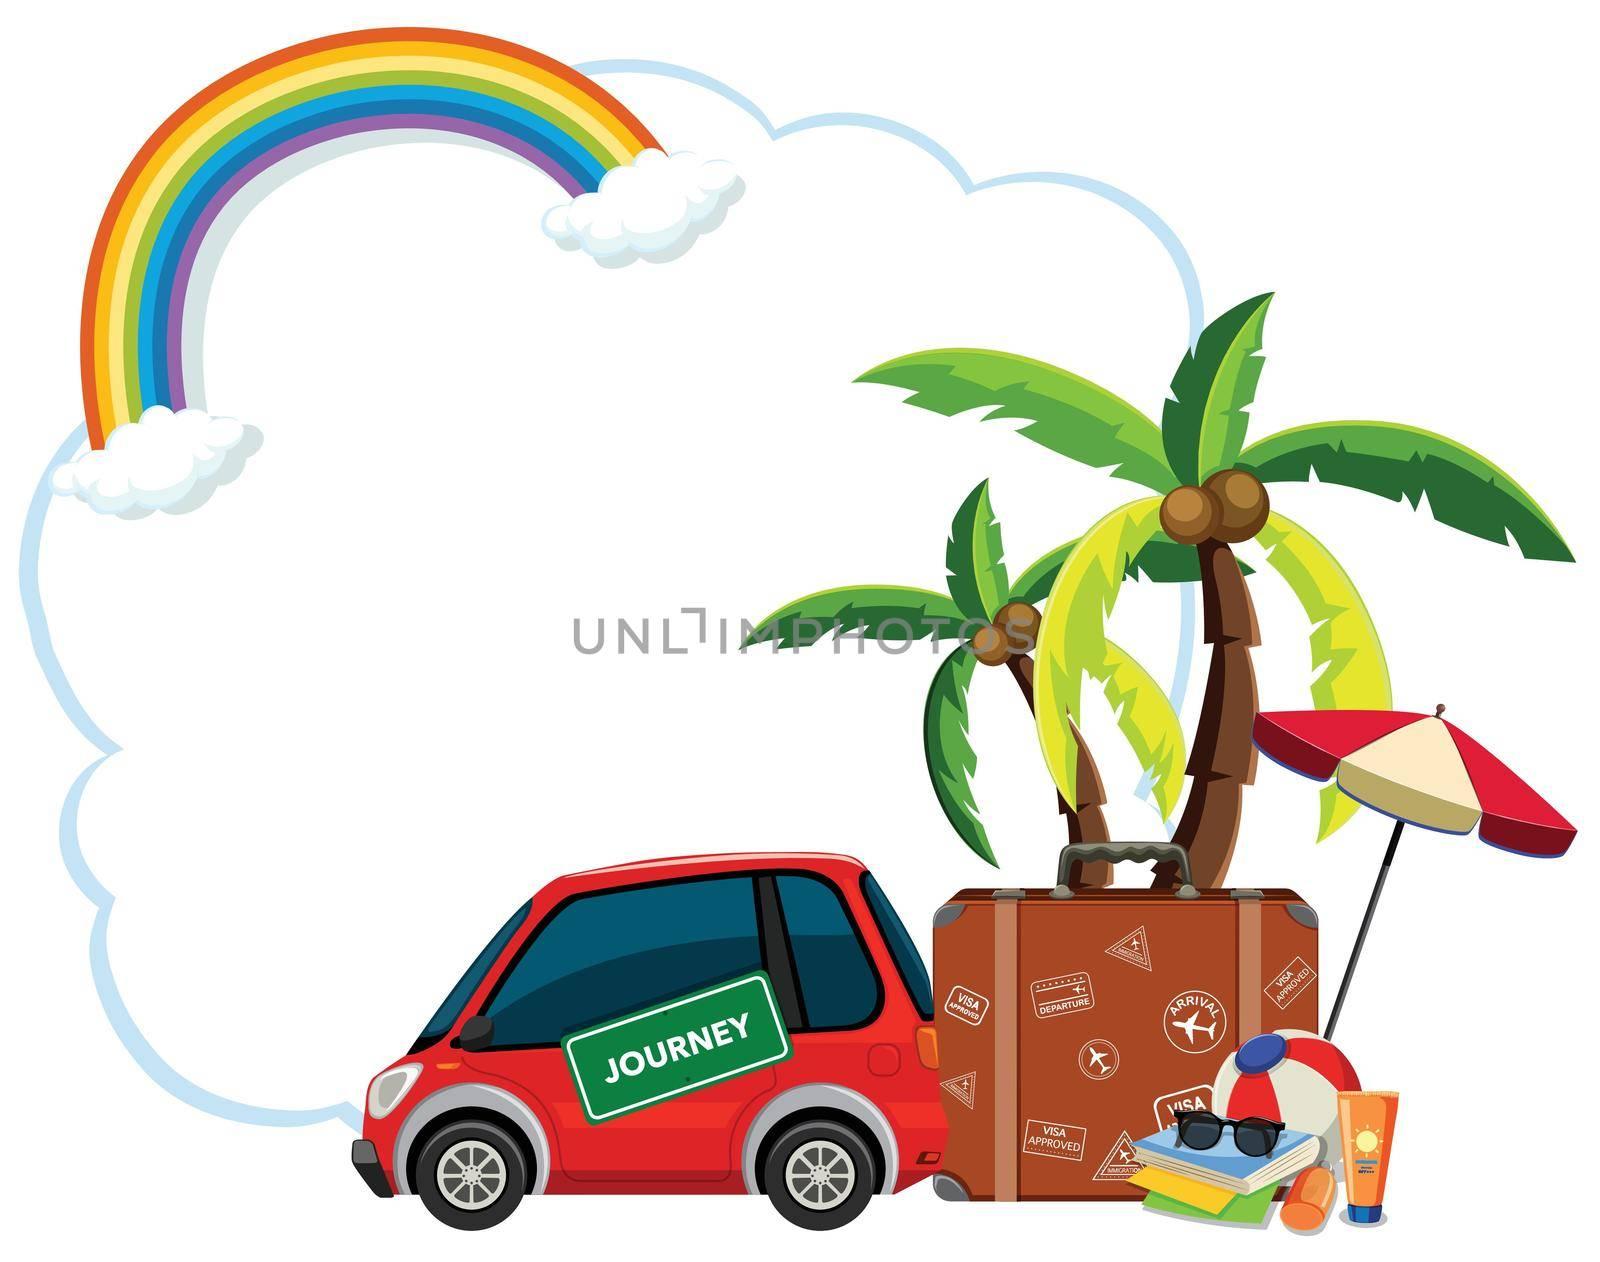 Travel element on blank template illustration